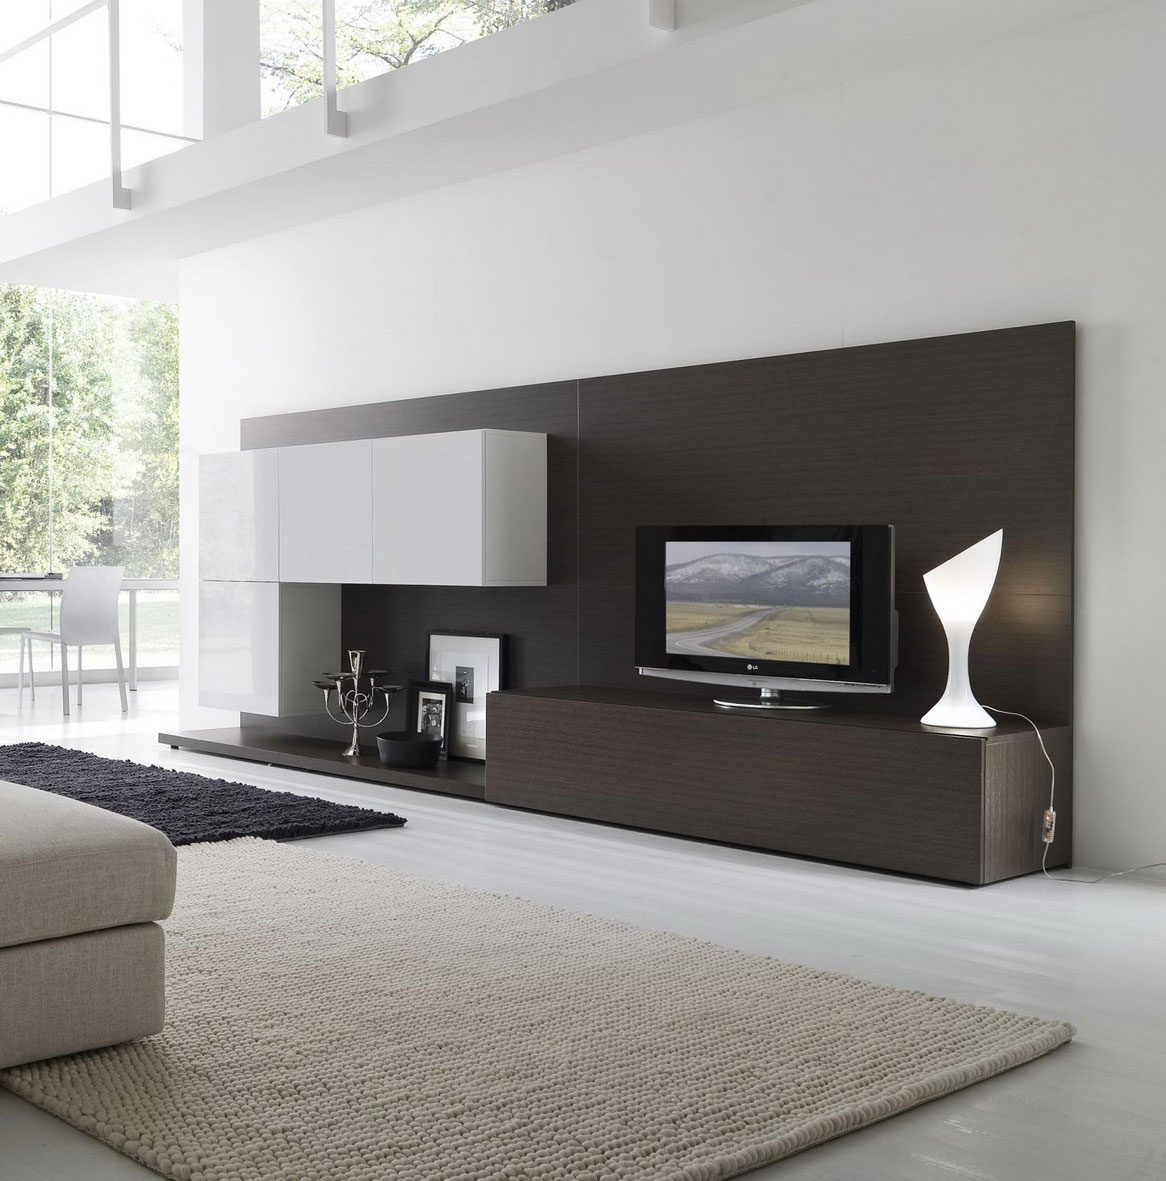 Famous Modern Living Room Interior Design 1166 x 1181 195 kB 1166x1181